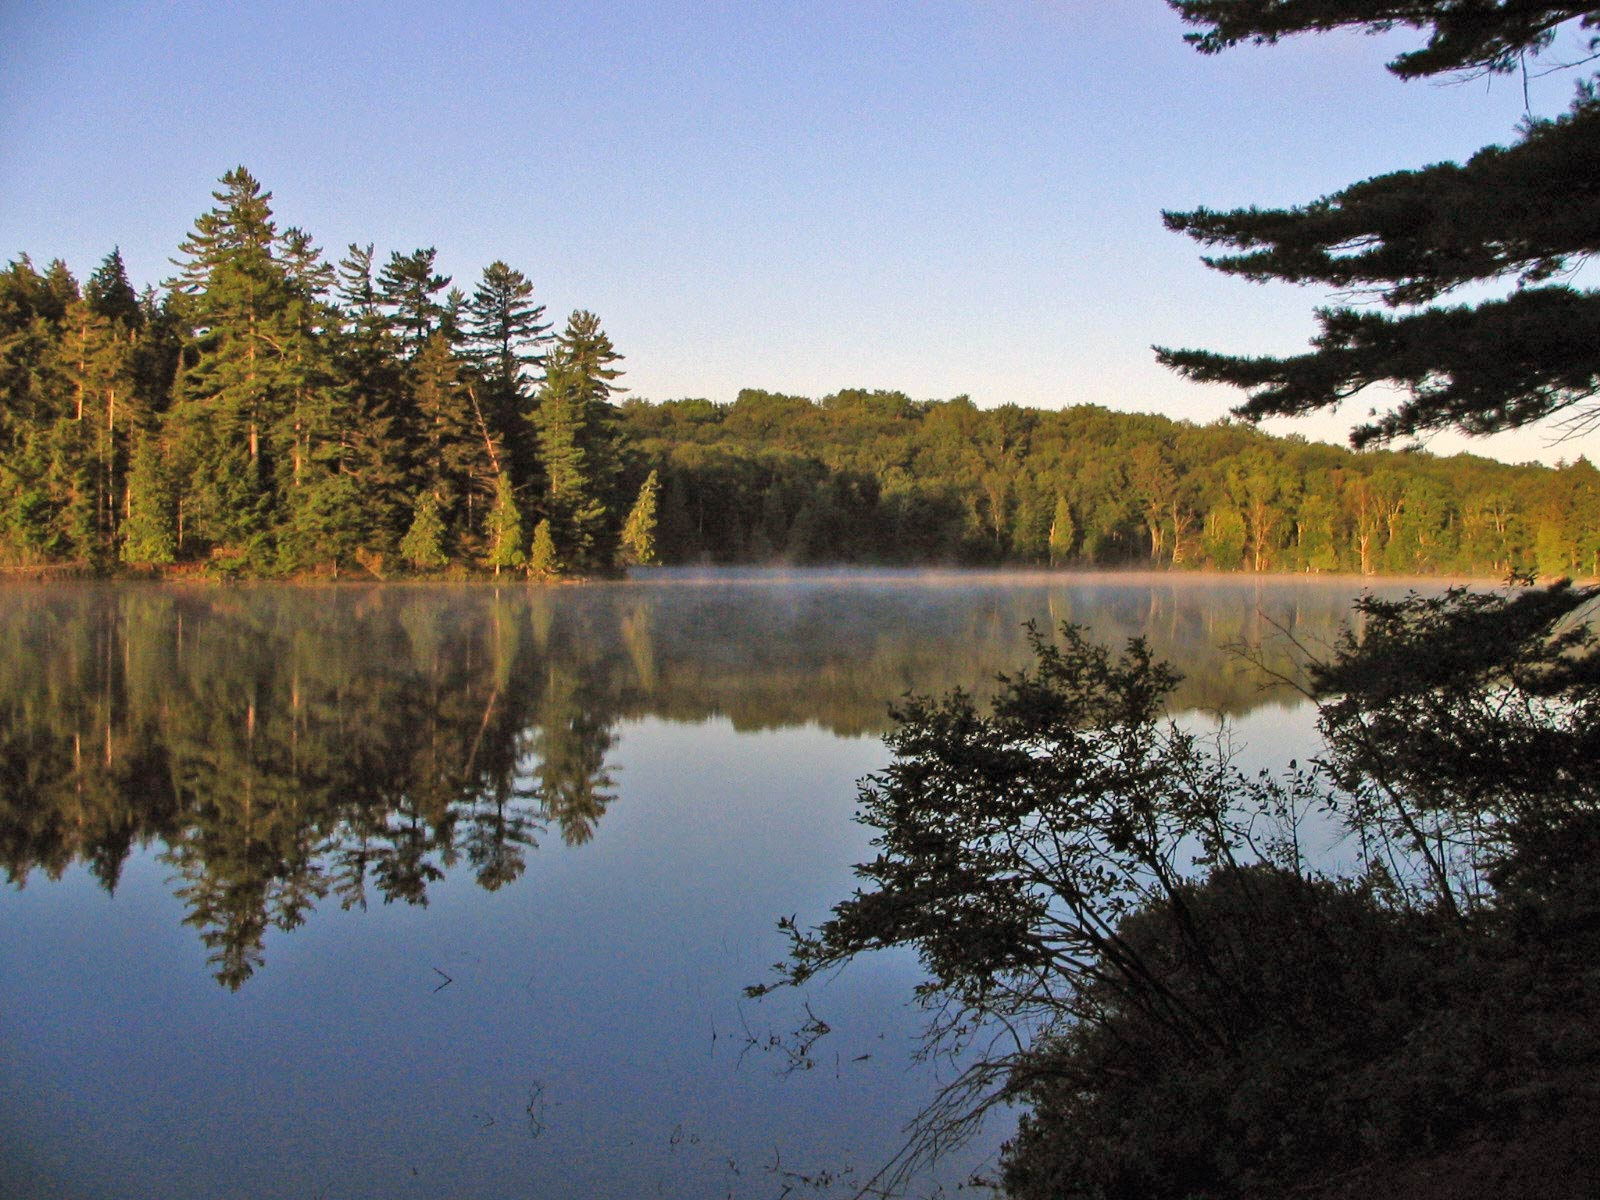 Long_Pond_-_St_Regis